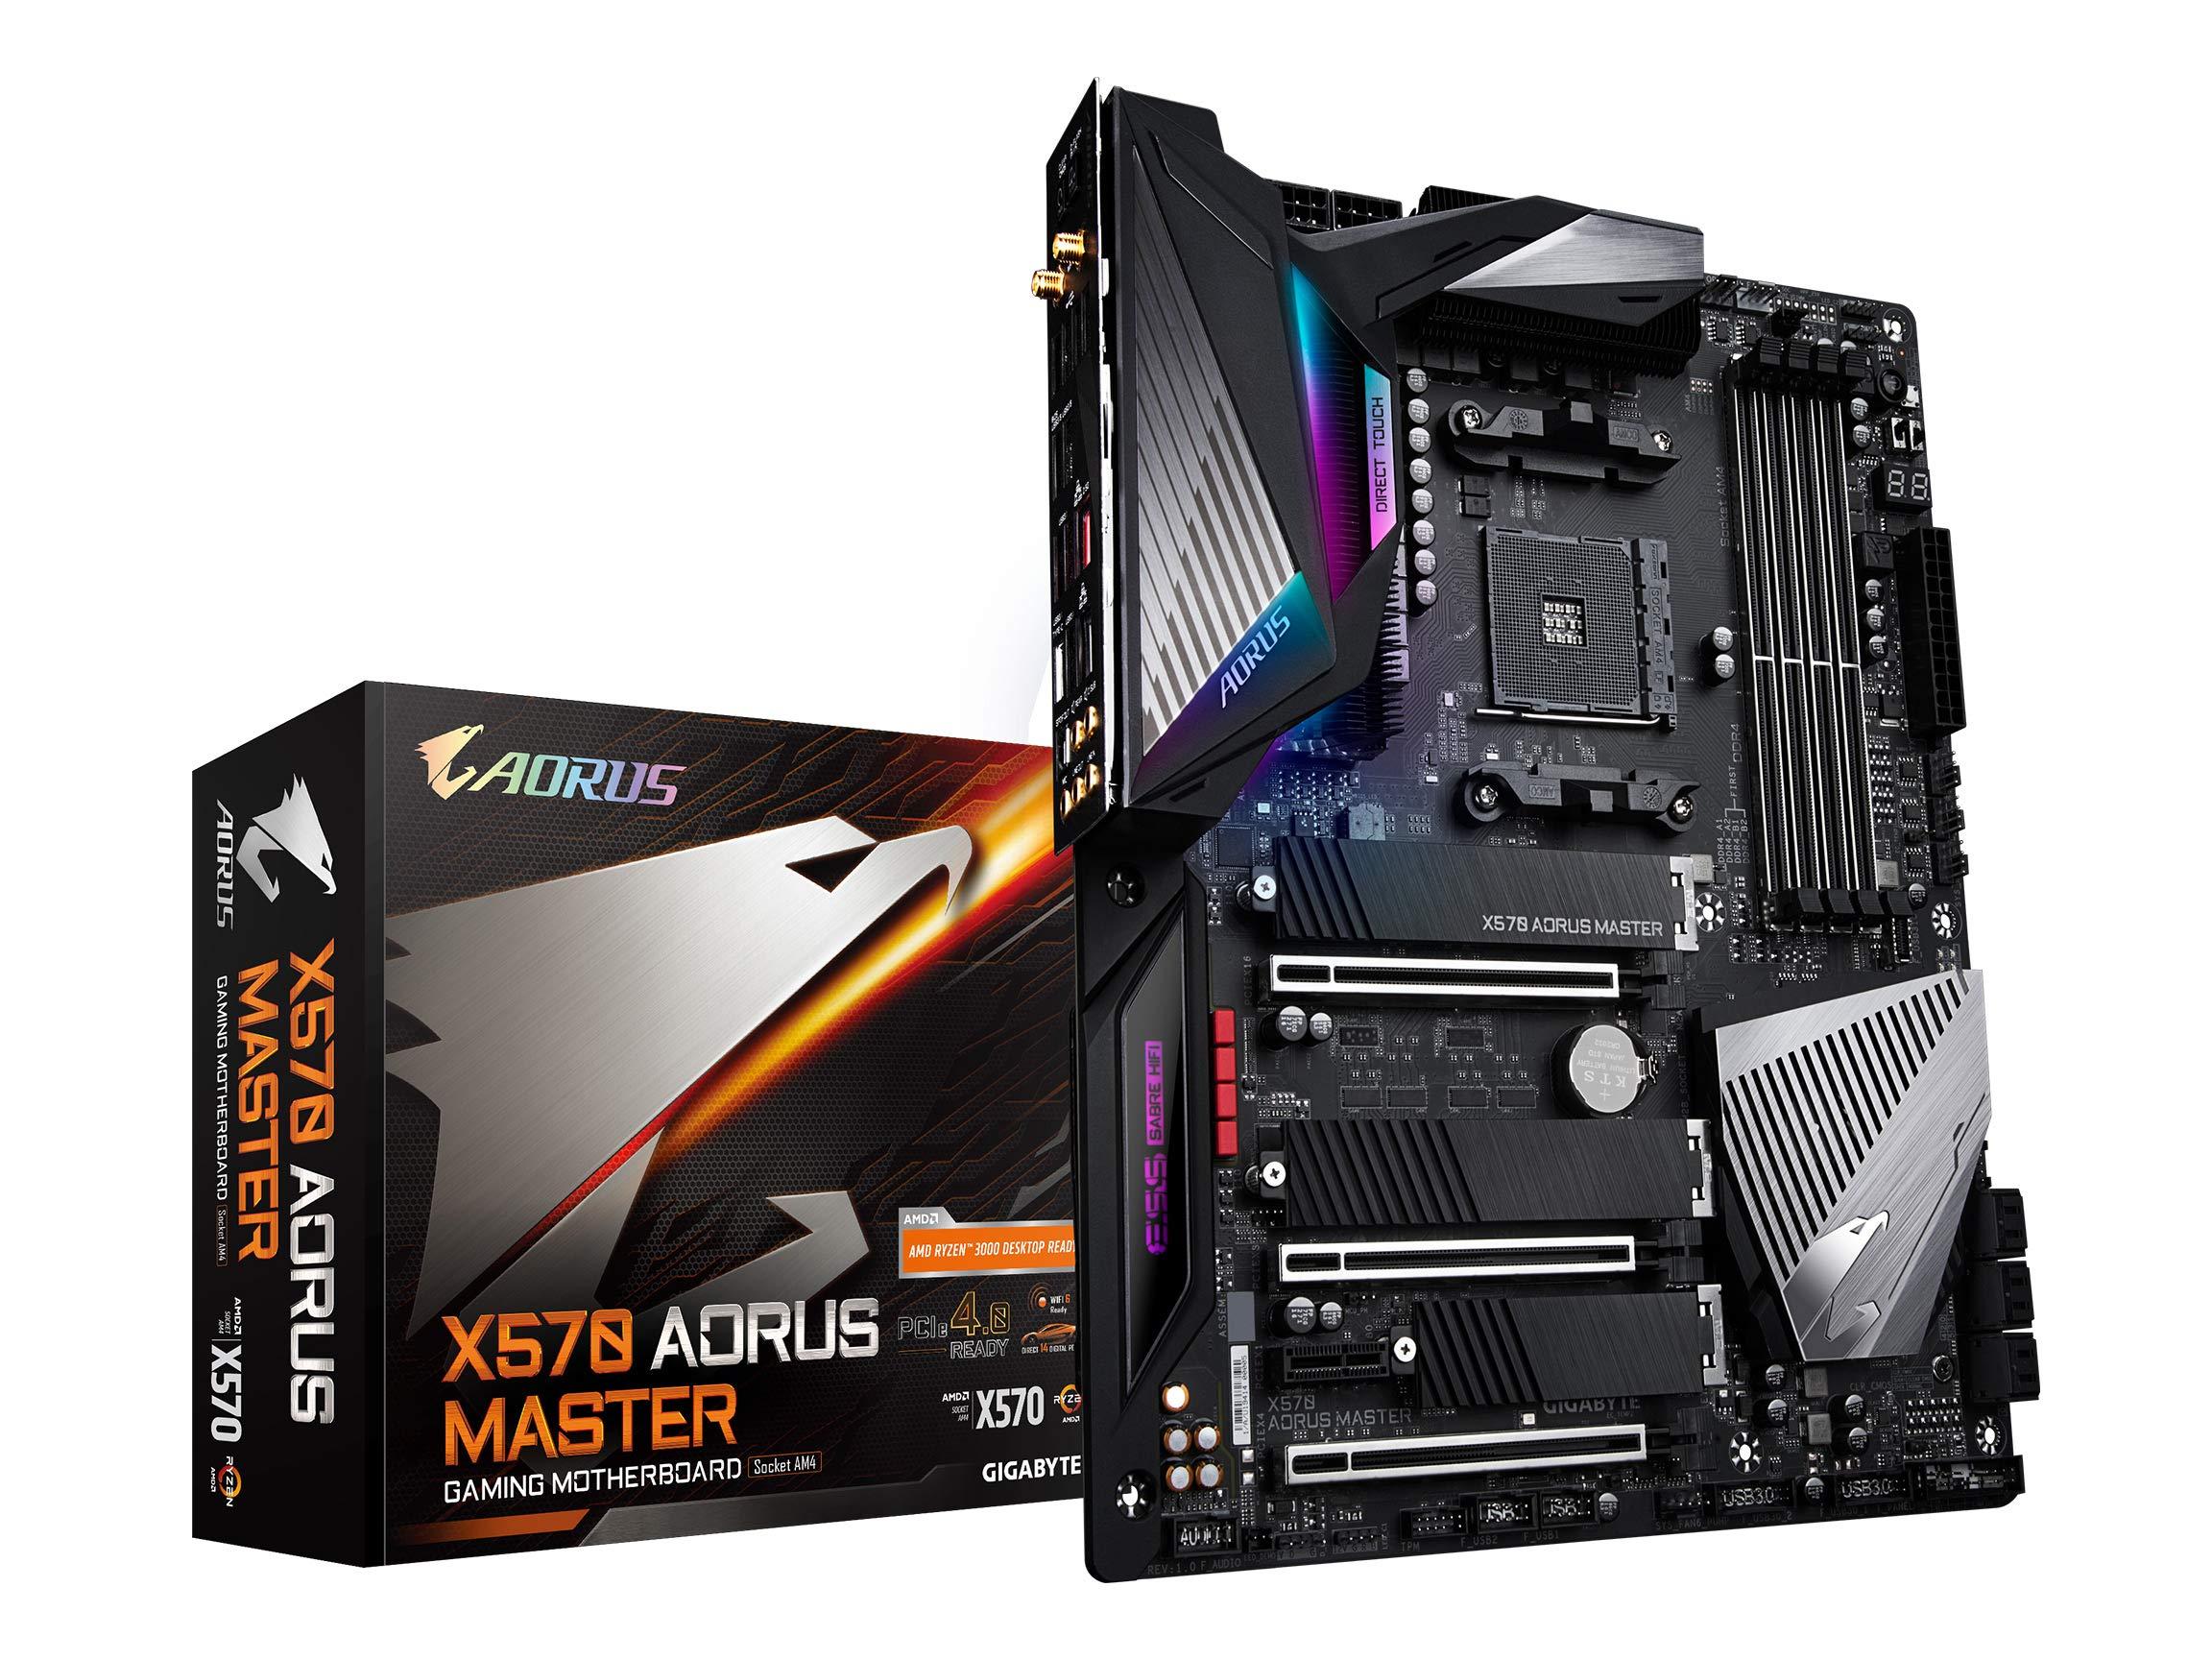 Gigabyte X570 Aorus Master (amd Ryzen 3000/x570/atx/pcie4...